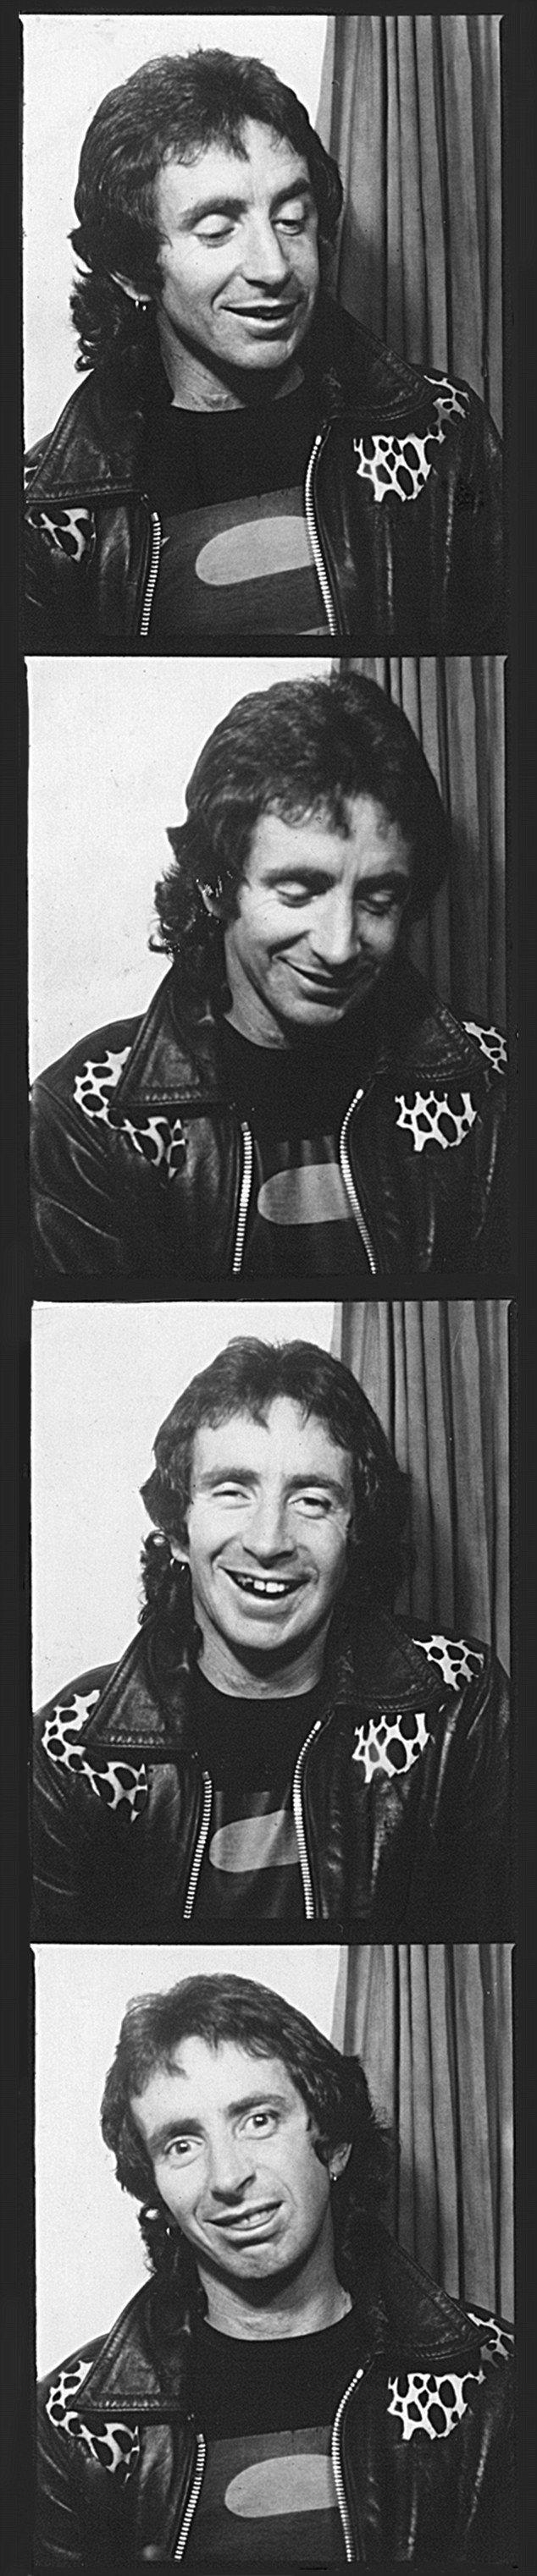 Irene Thornton ex-wife of AC/DC's Bon Scott says crash made him into superstar